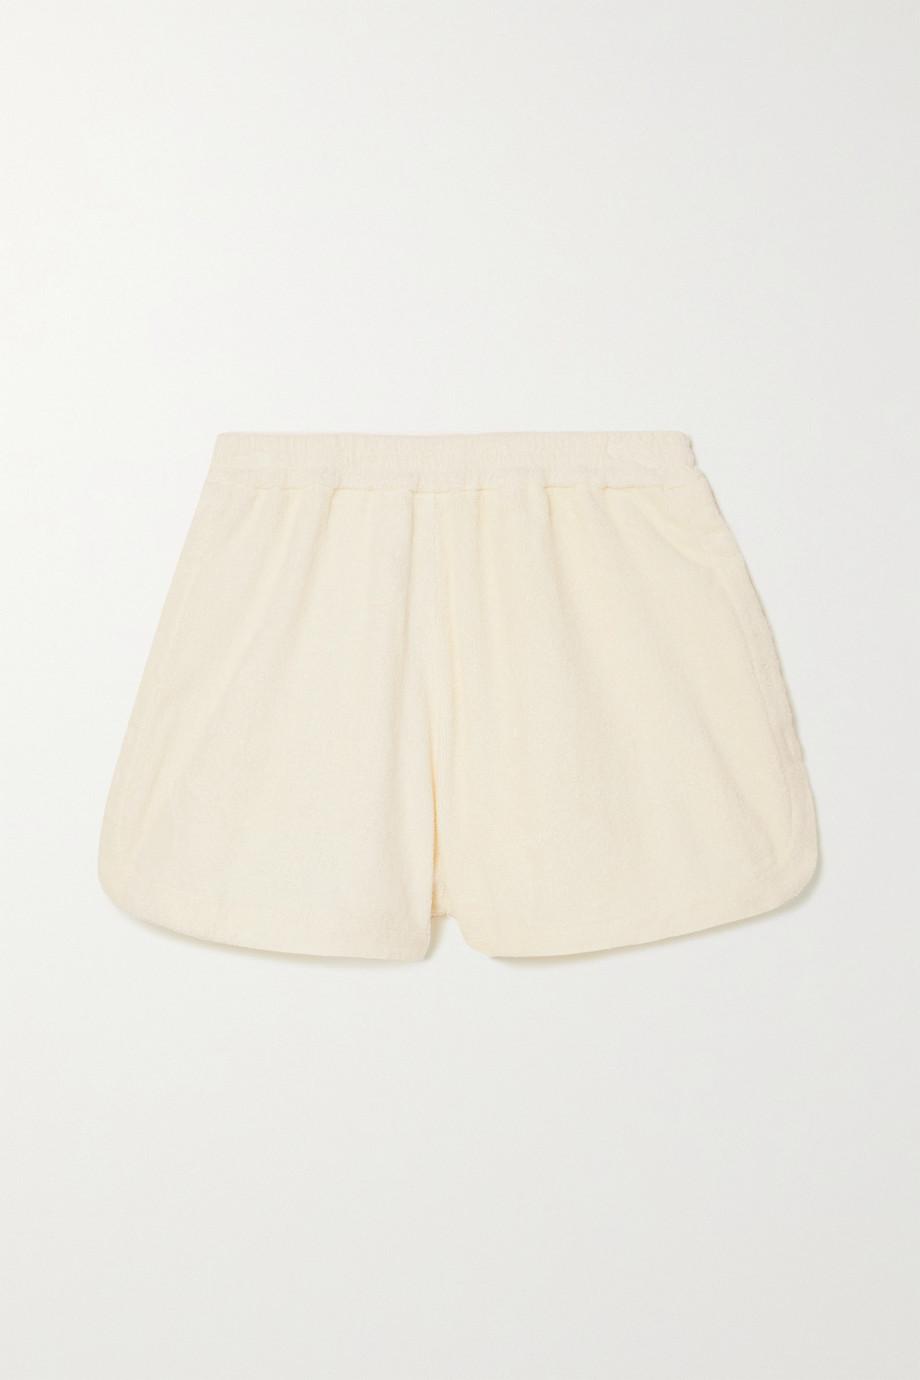 TERRY Cruise 纯棉毛巾布短裤